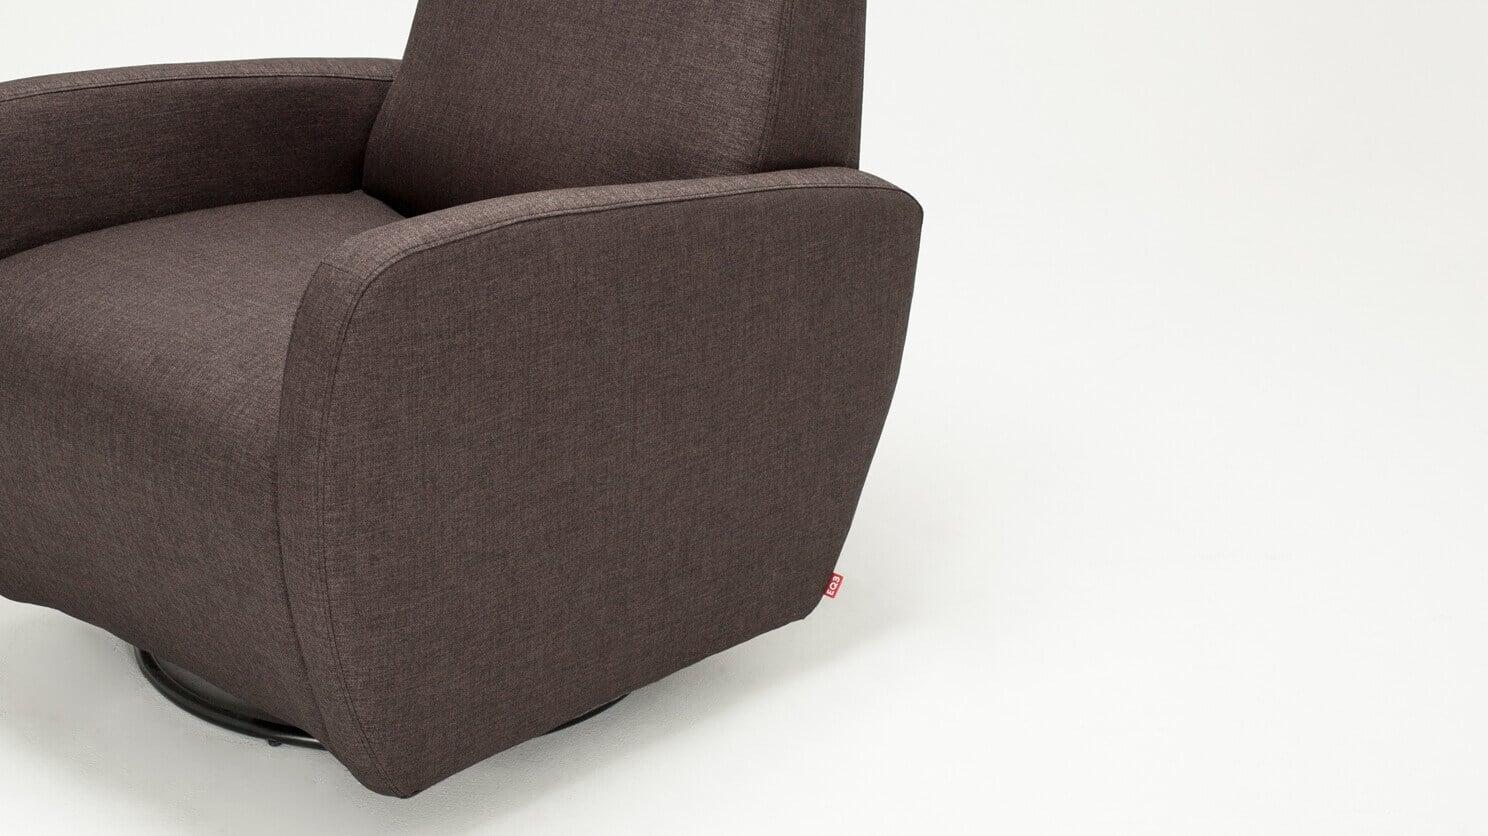 30073 71 3 chairs karbon swivel chair polo slate detail 03